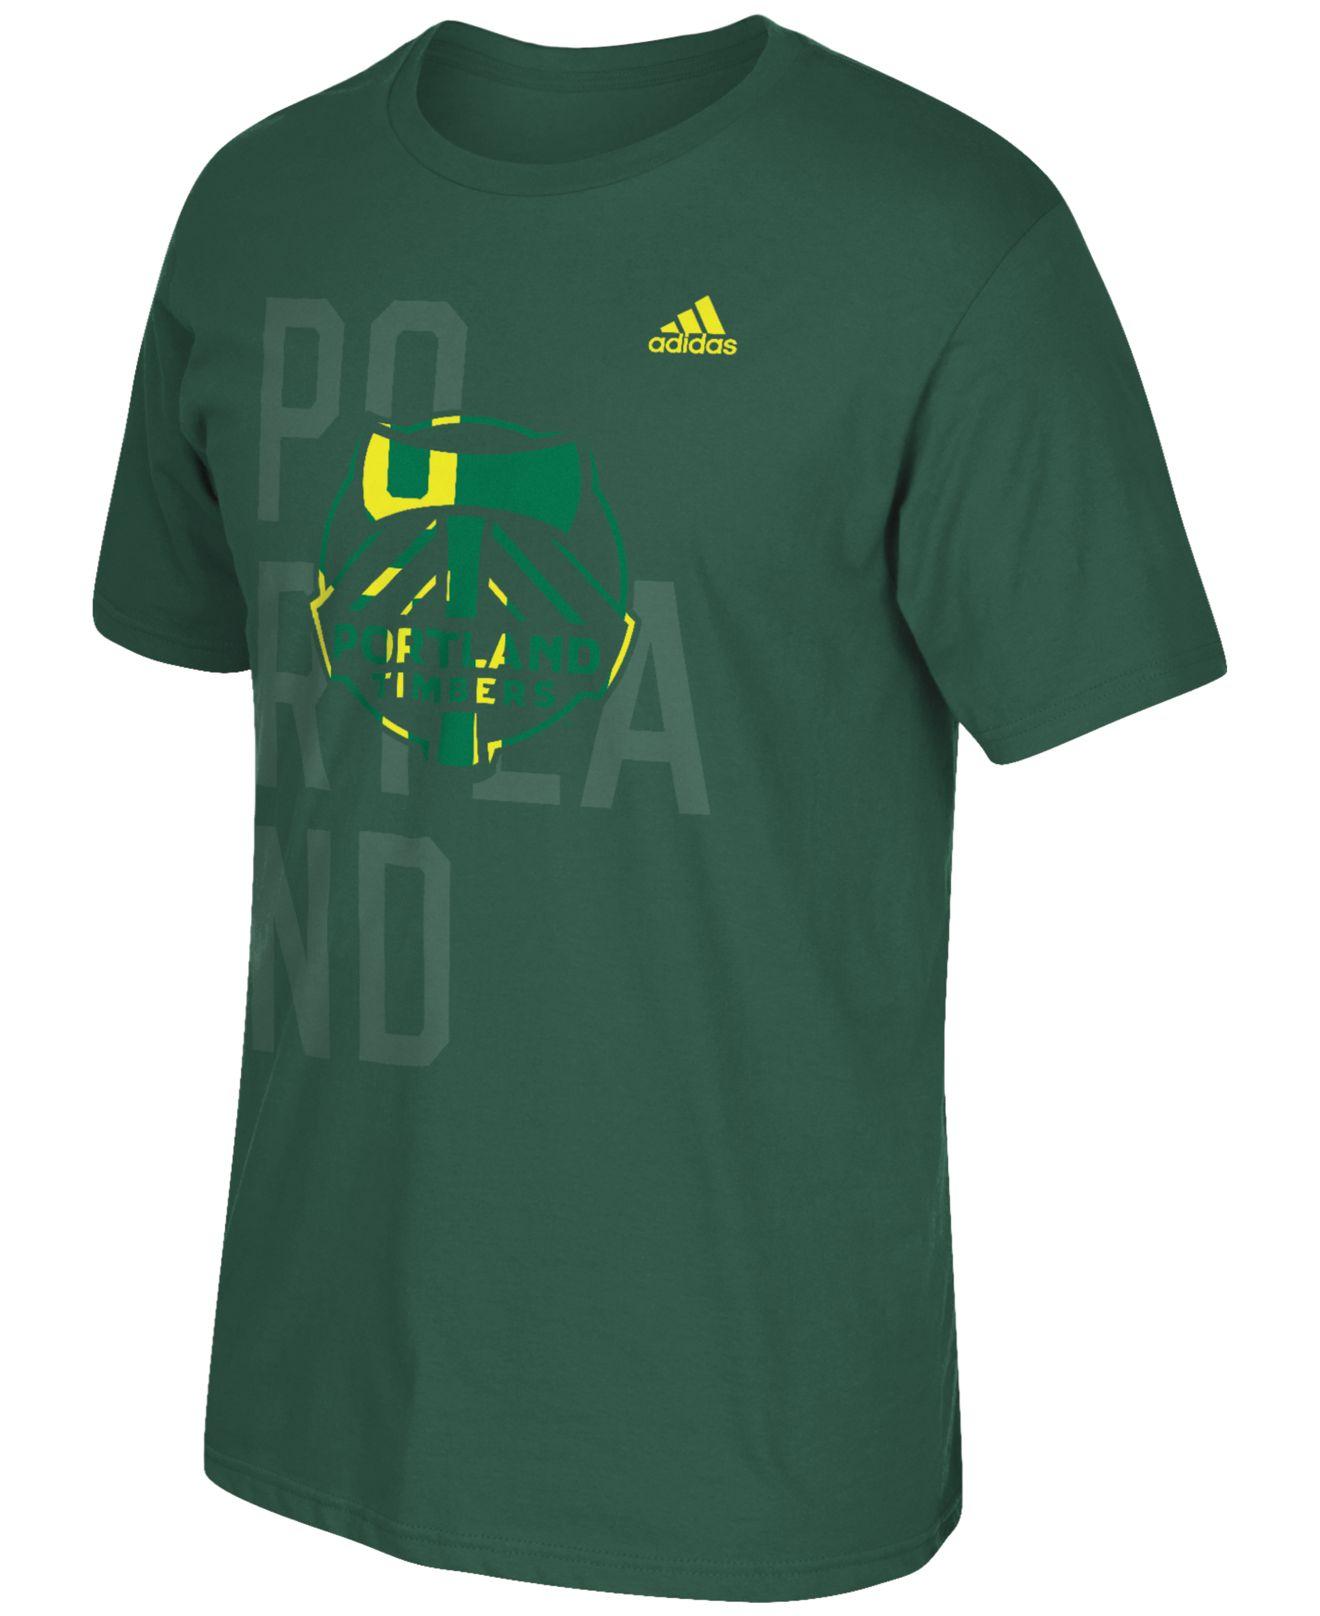 Adidas originals men 39 s portland timbers shine through t for T shirt printing in portland oregon